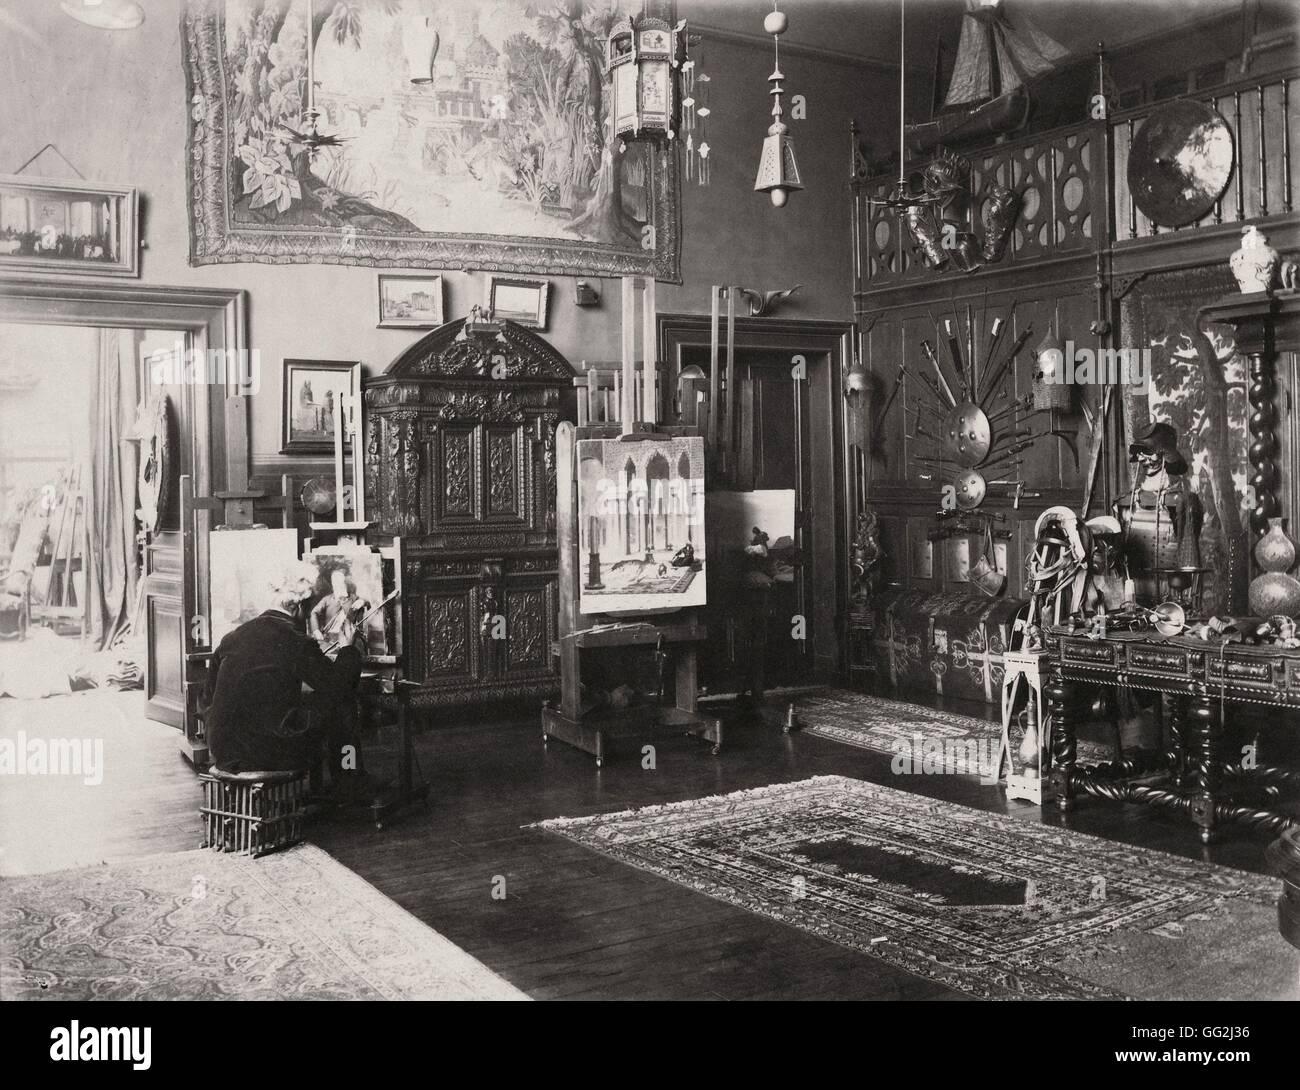 French painter and sculptor Jean-Léon Gérôme in his Paris studio located 6 rue de Bruxelles in the - Stock Image